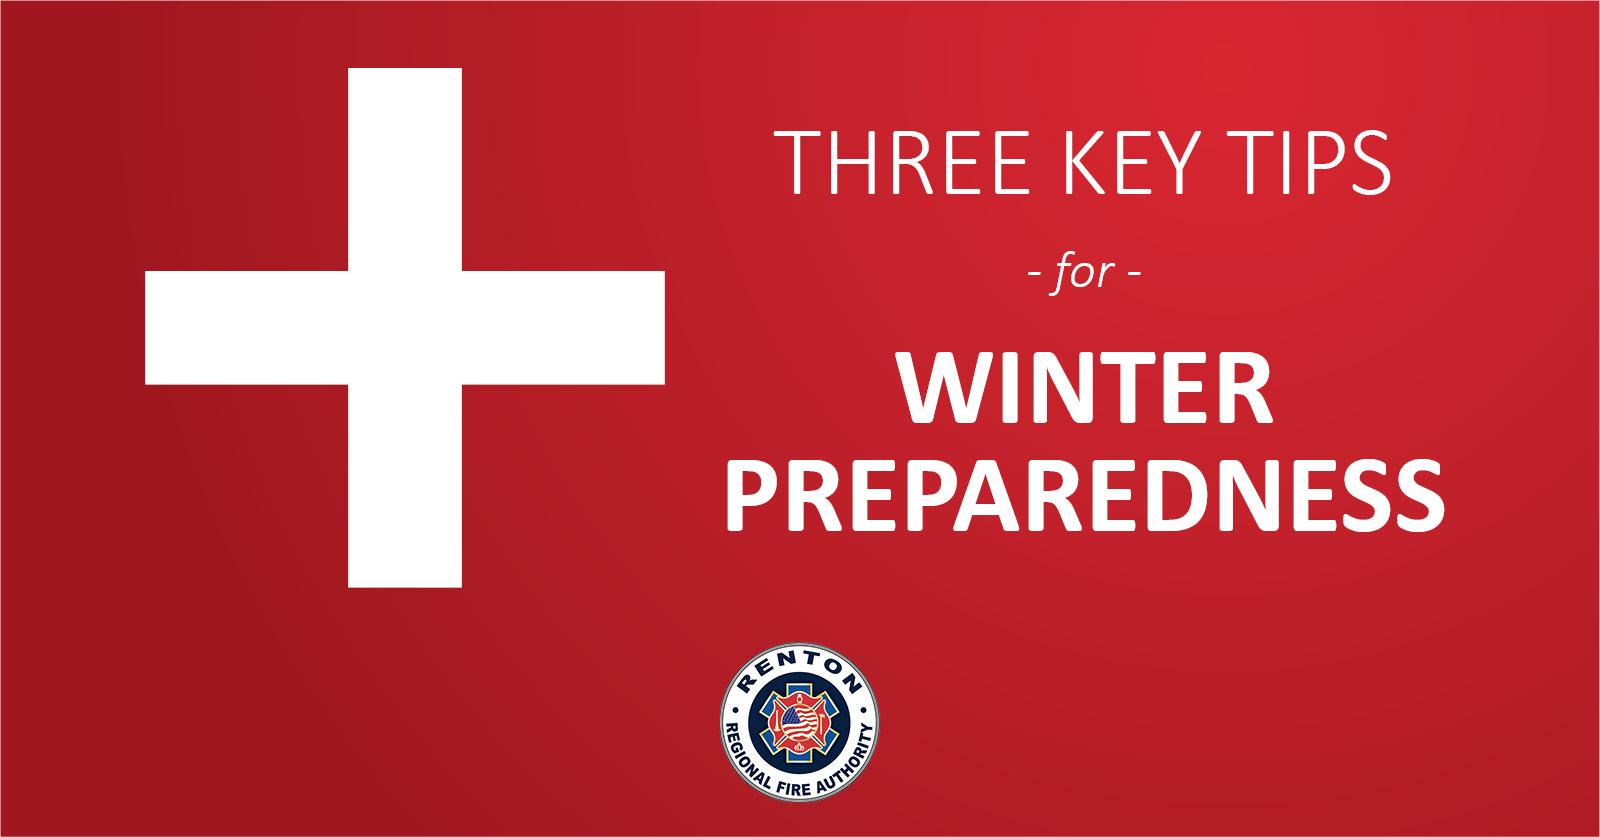 Three Key Tips for Winter Preparedness